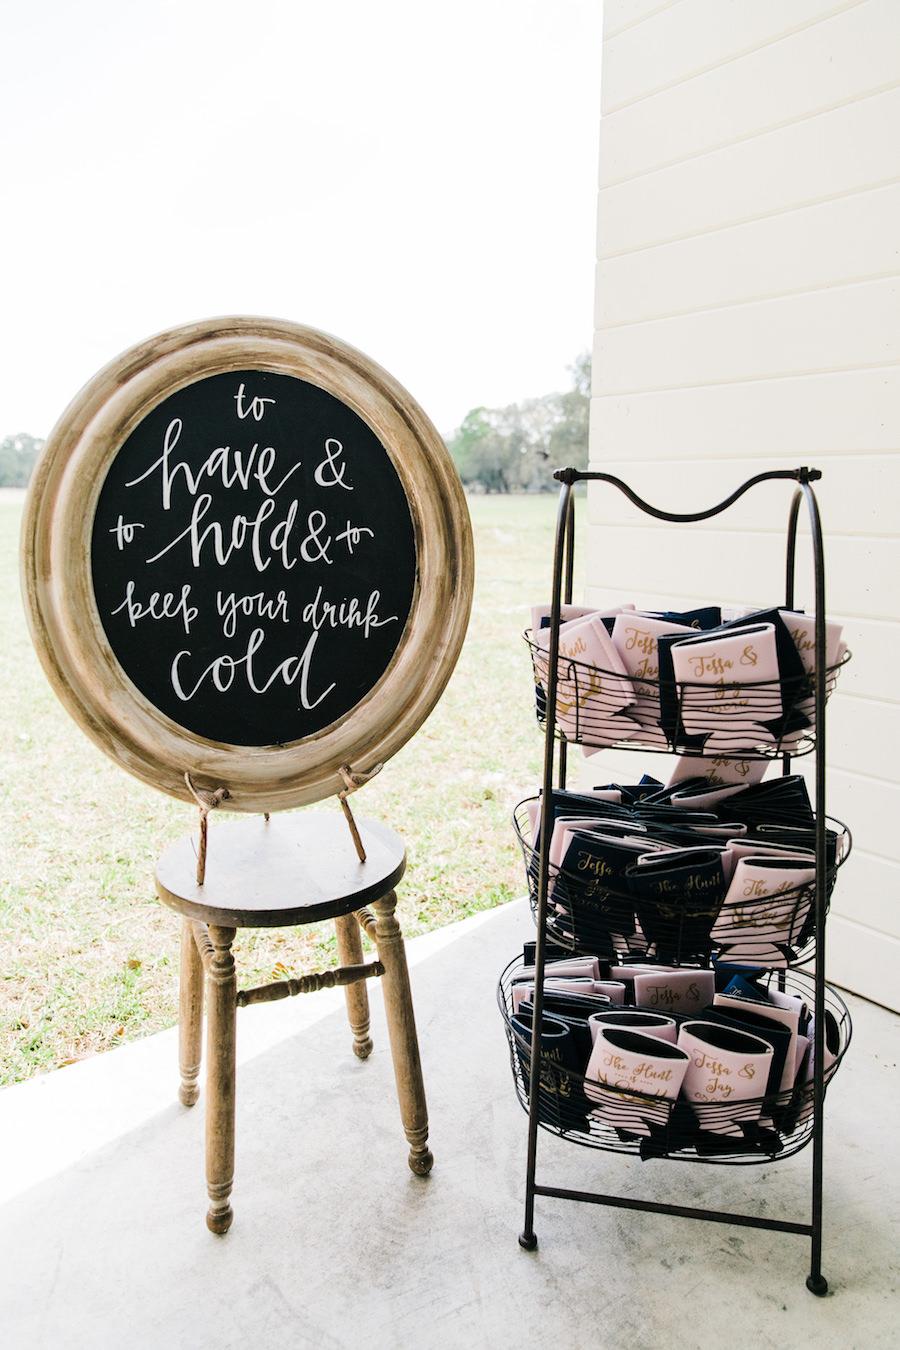 Wedding Reception Chalkboard Sign   Rustic, Country Wedding Inspiration   Unique Drink Station Koozie Wedding Favor Ideas